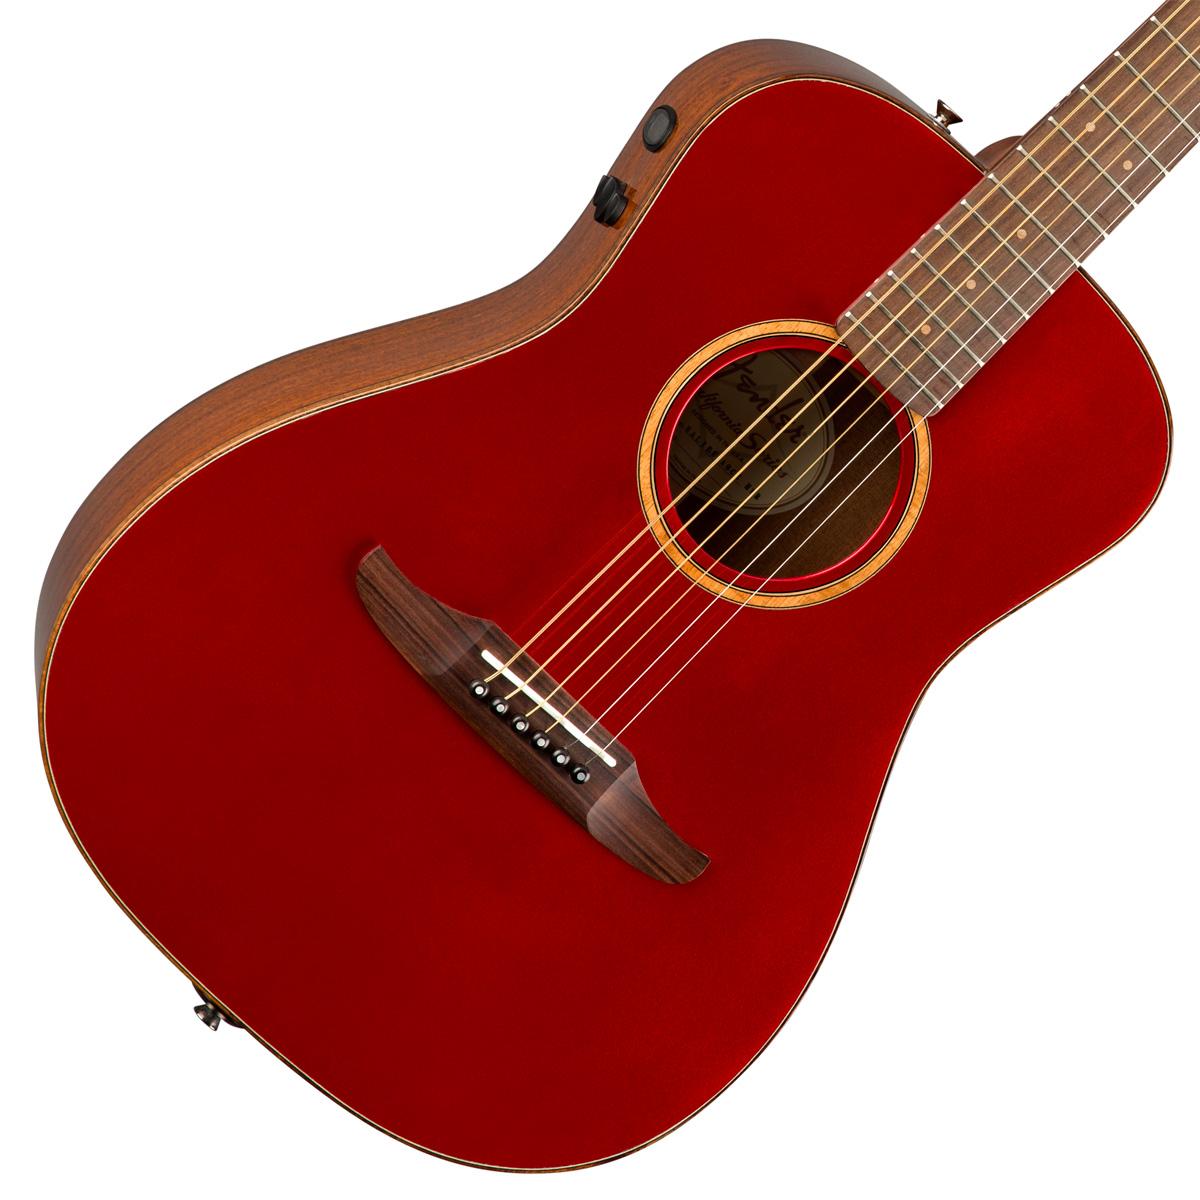 FENDER / MALIBU CLASSIC HOT ROD RED METALLIC (HRM) 【CALIFORNIA SERIES】フェンダー アコースティックギター